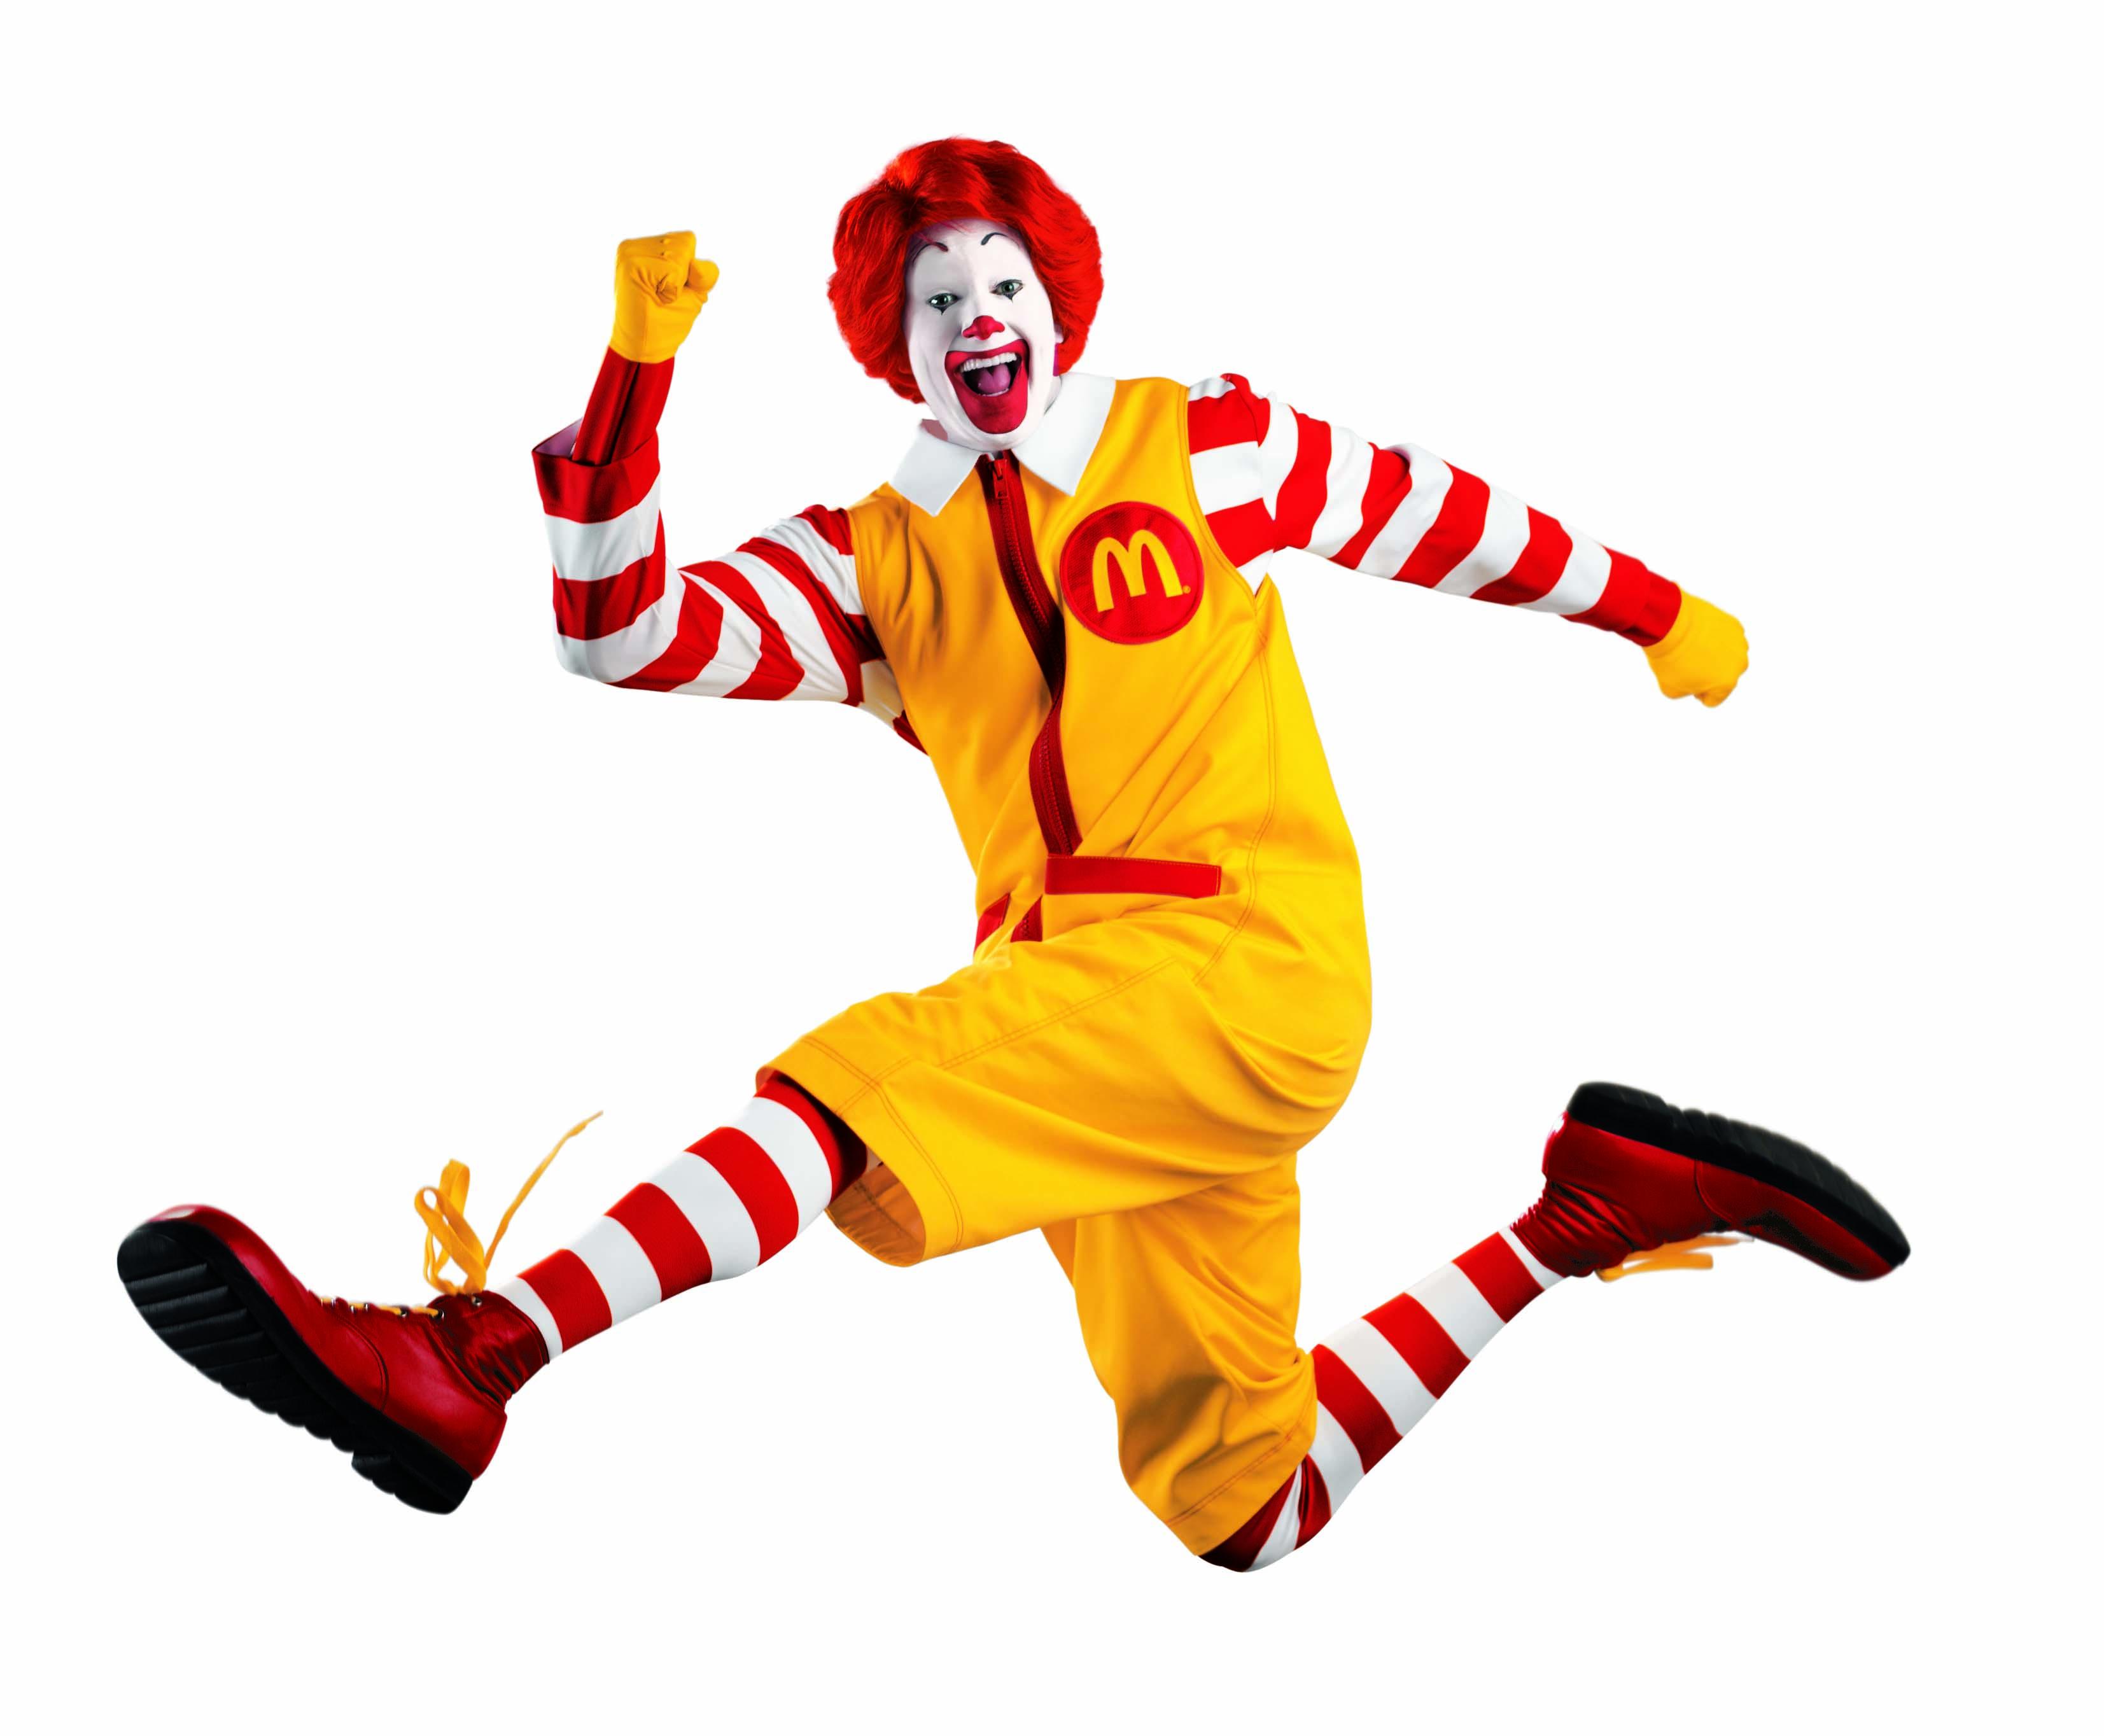 McDonaldphobia